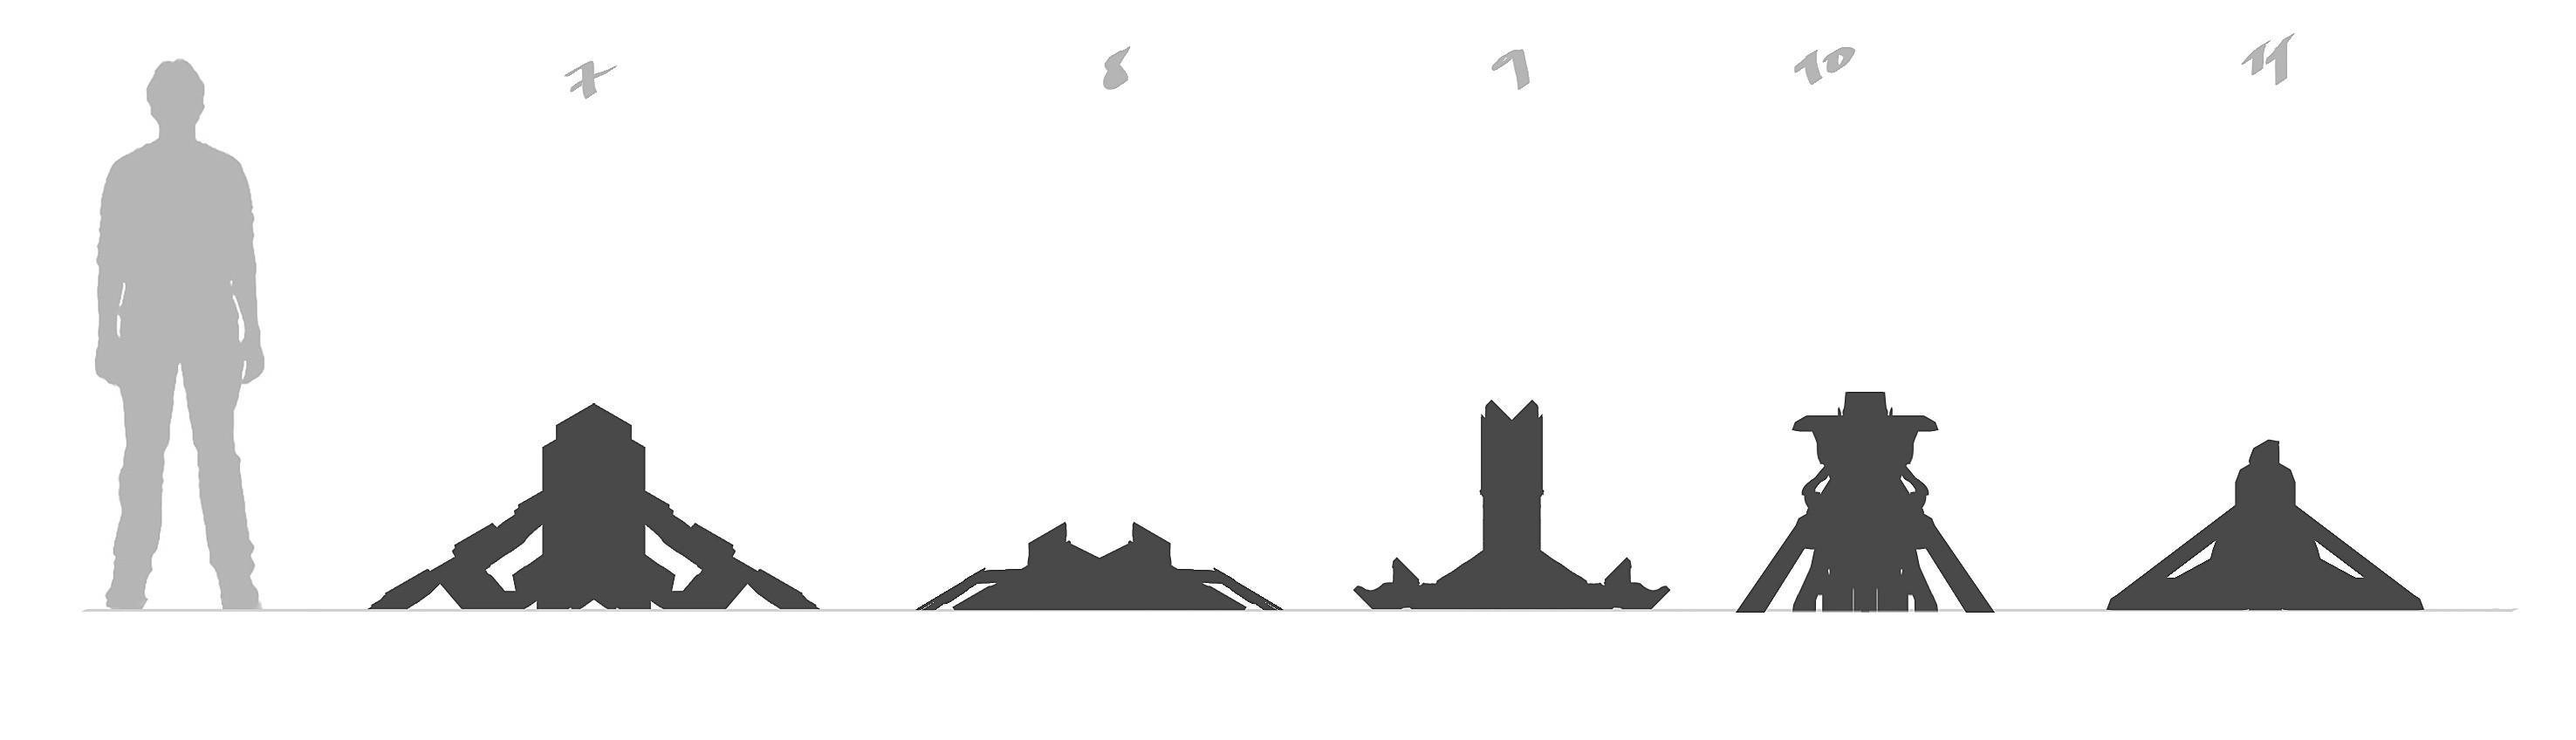 Shape explorations 2